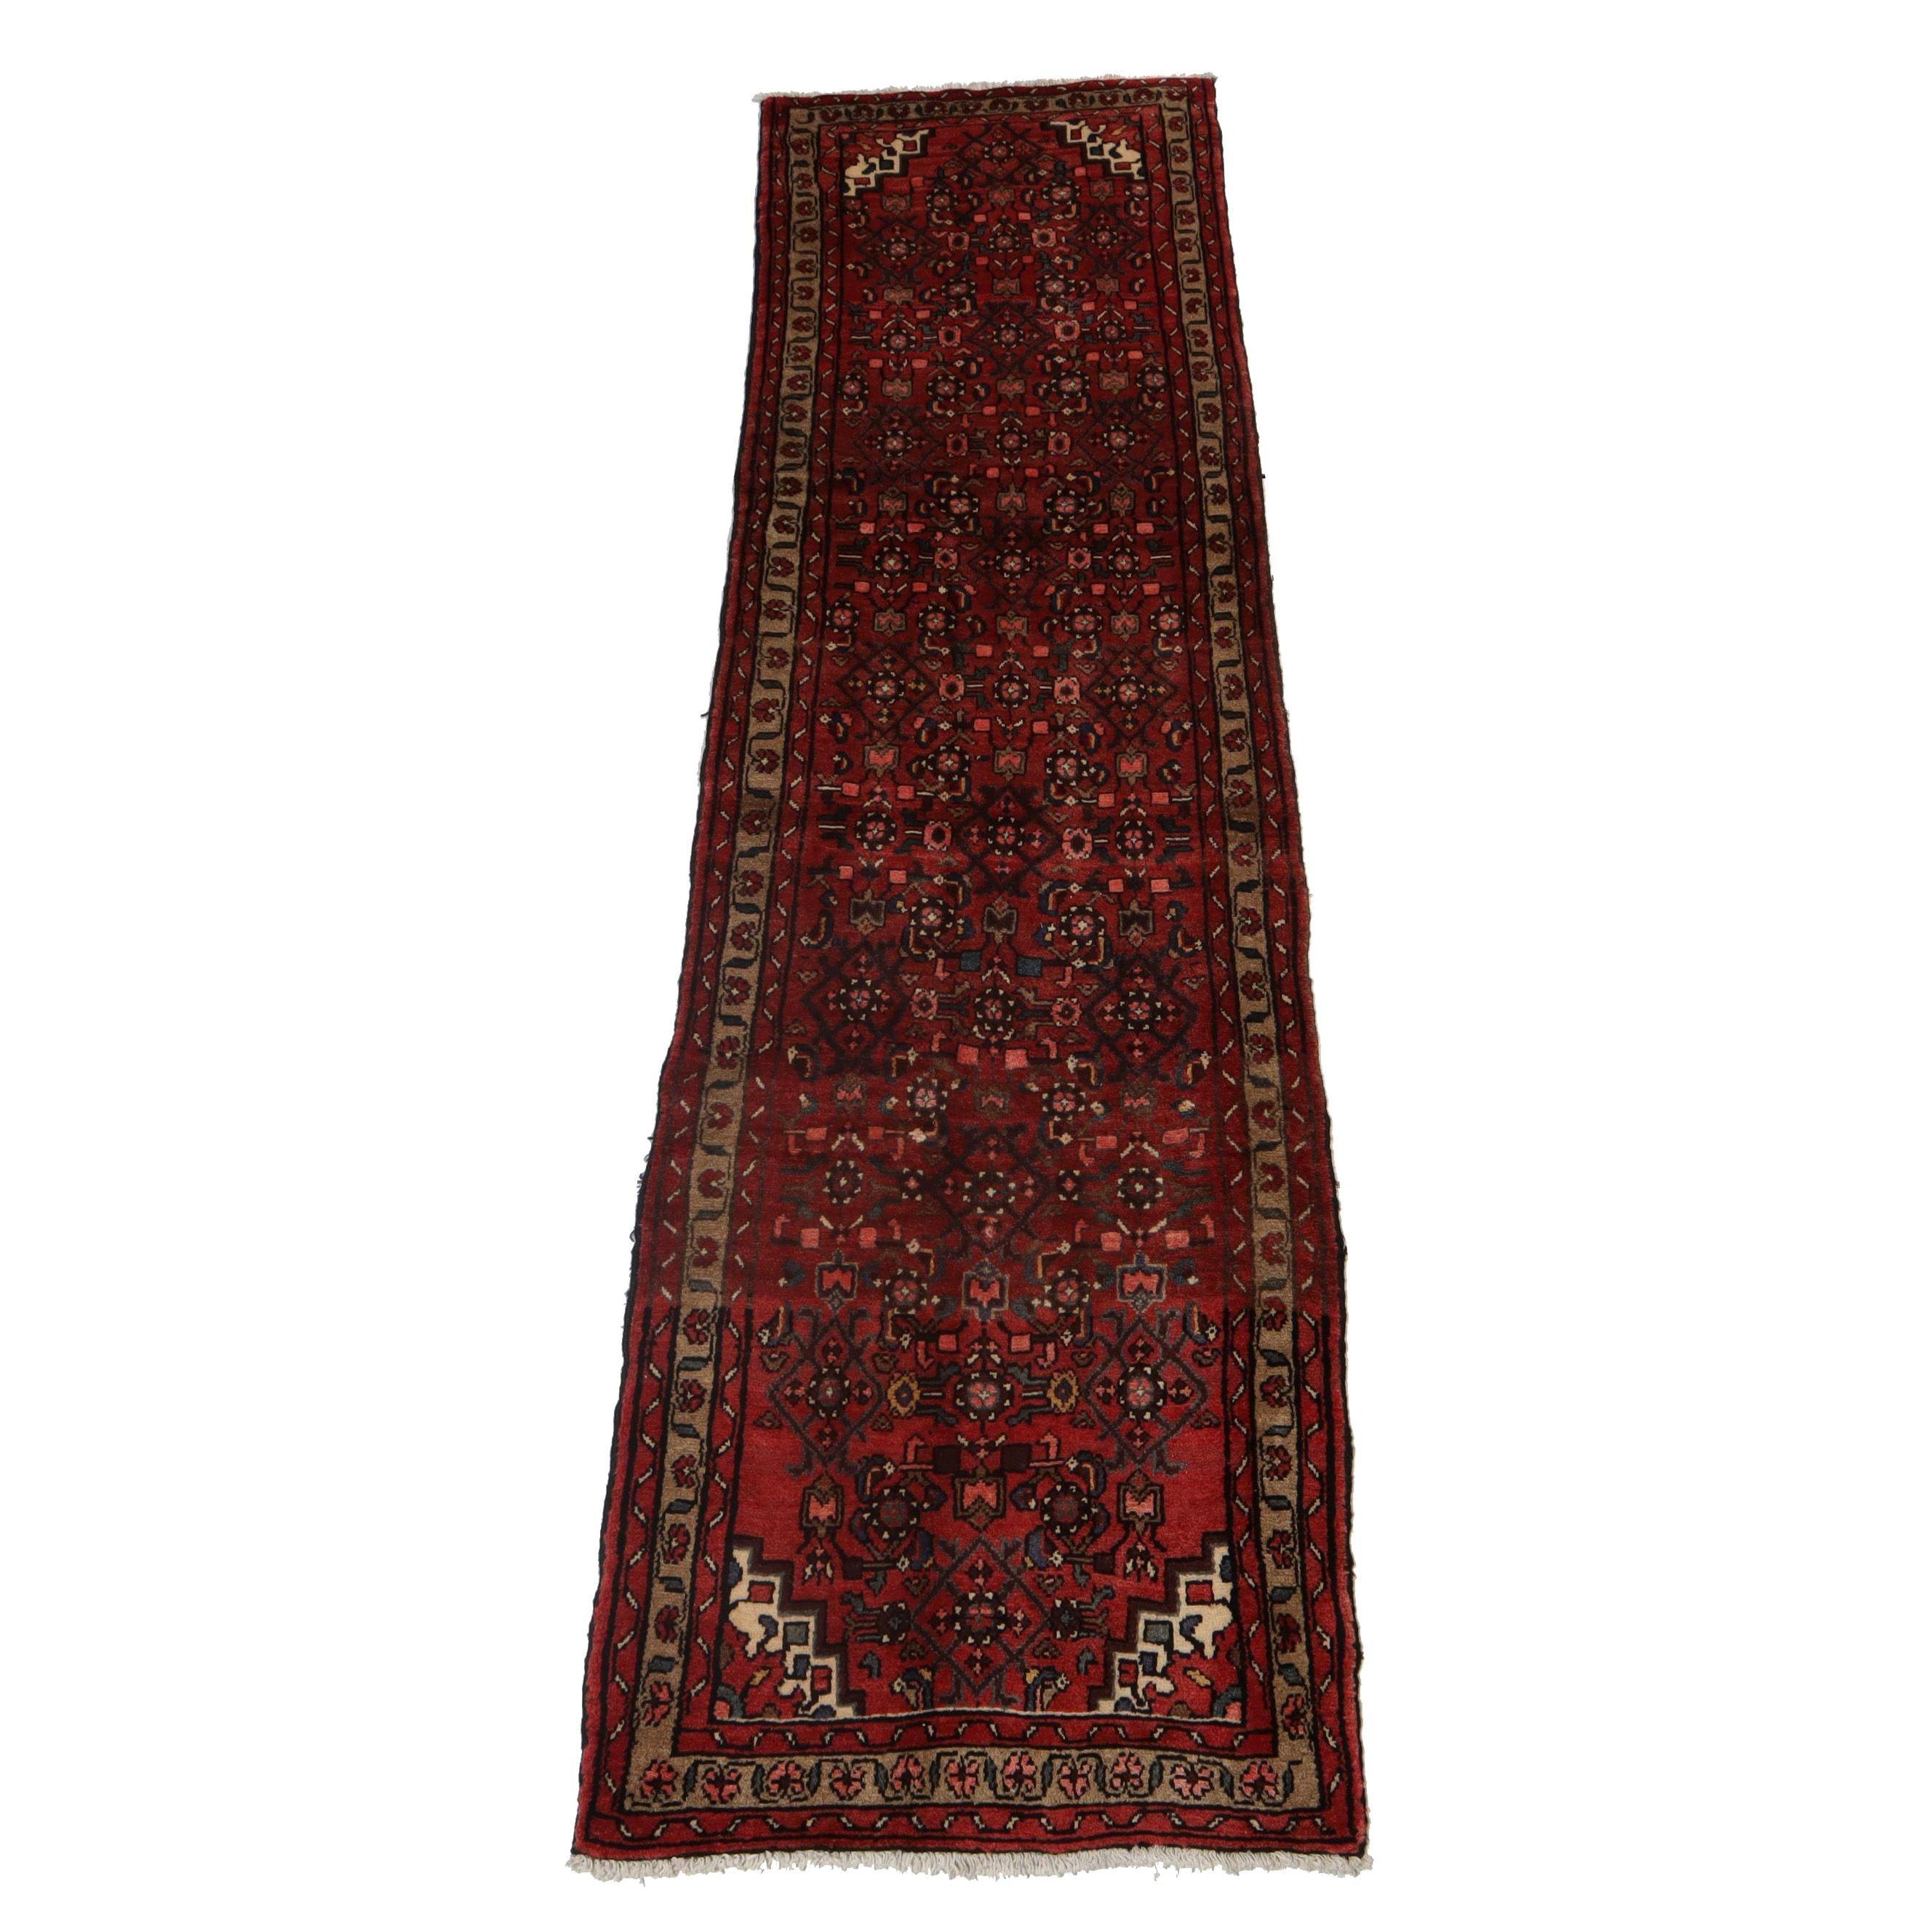 2'11 x 9'10 Hand-Knotted Persian Bibikabad Wool Carpet, Circa 1960